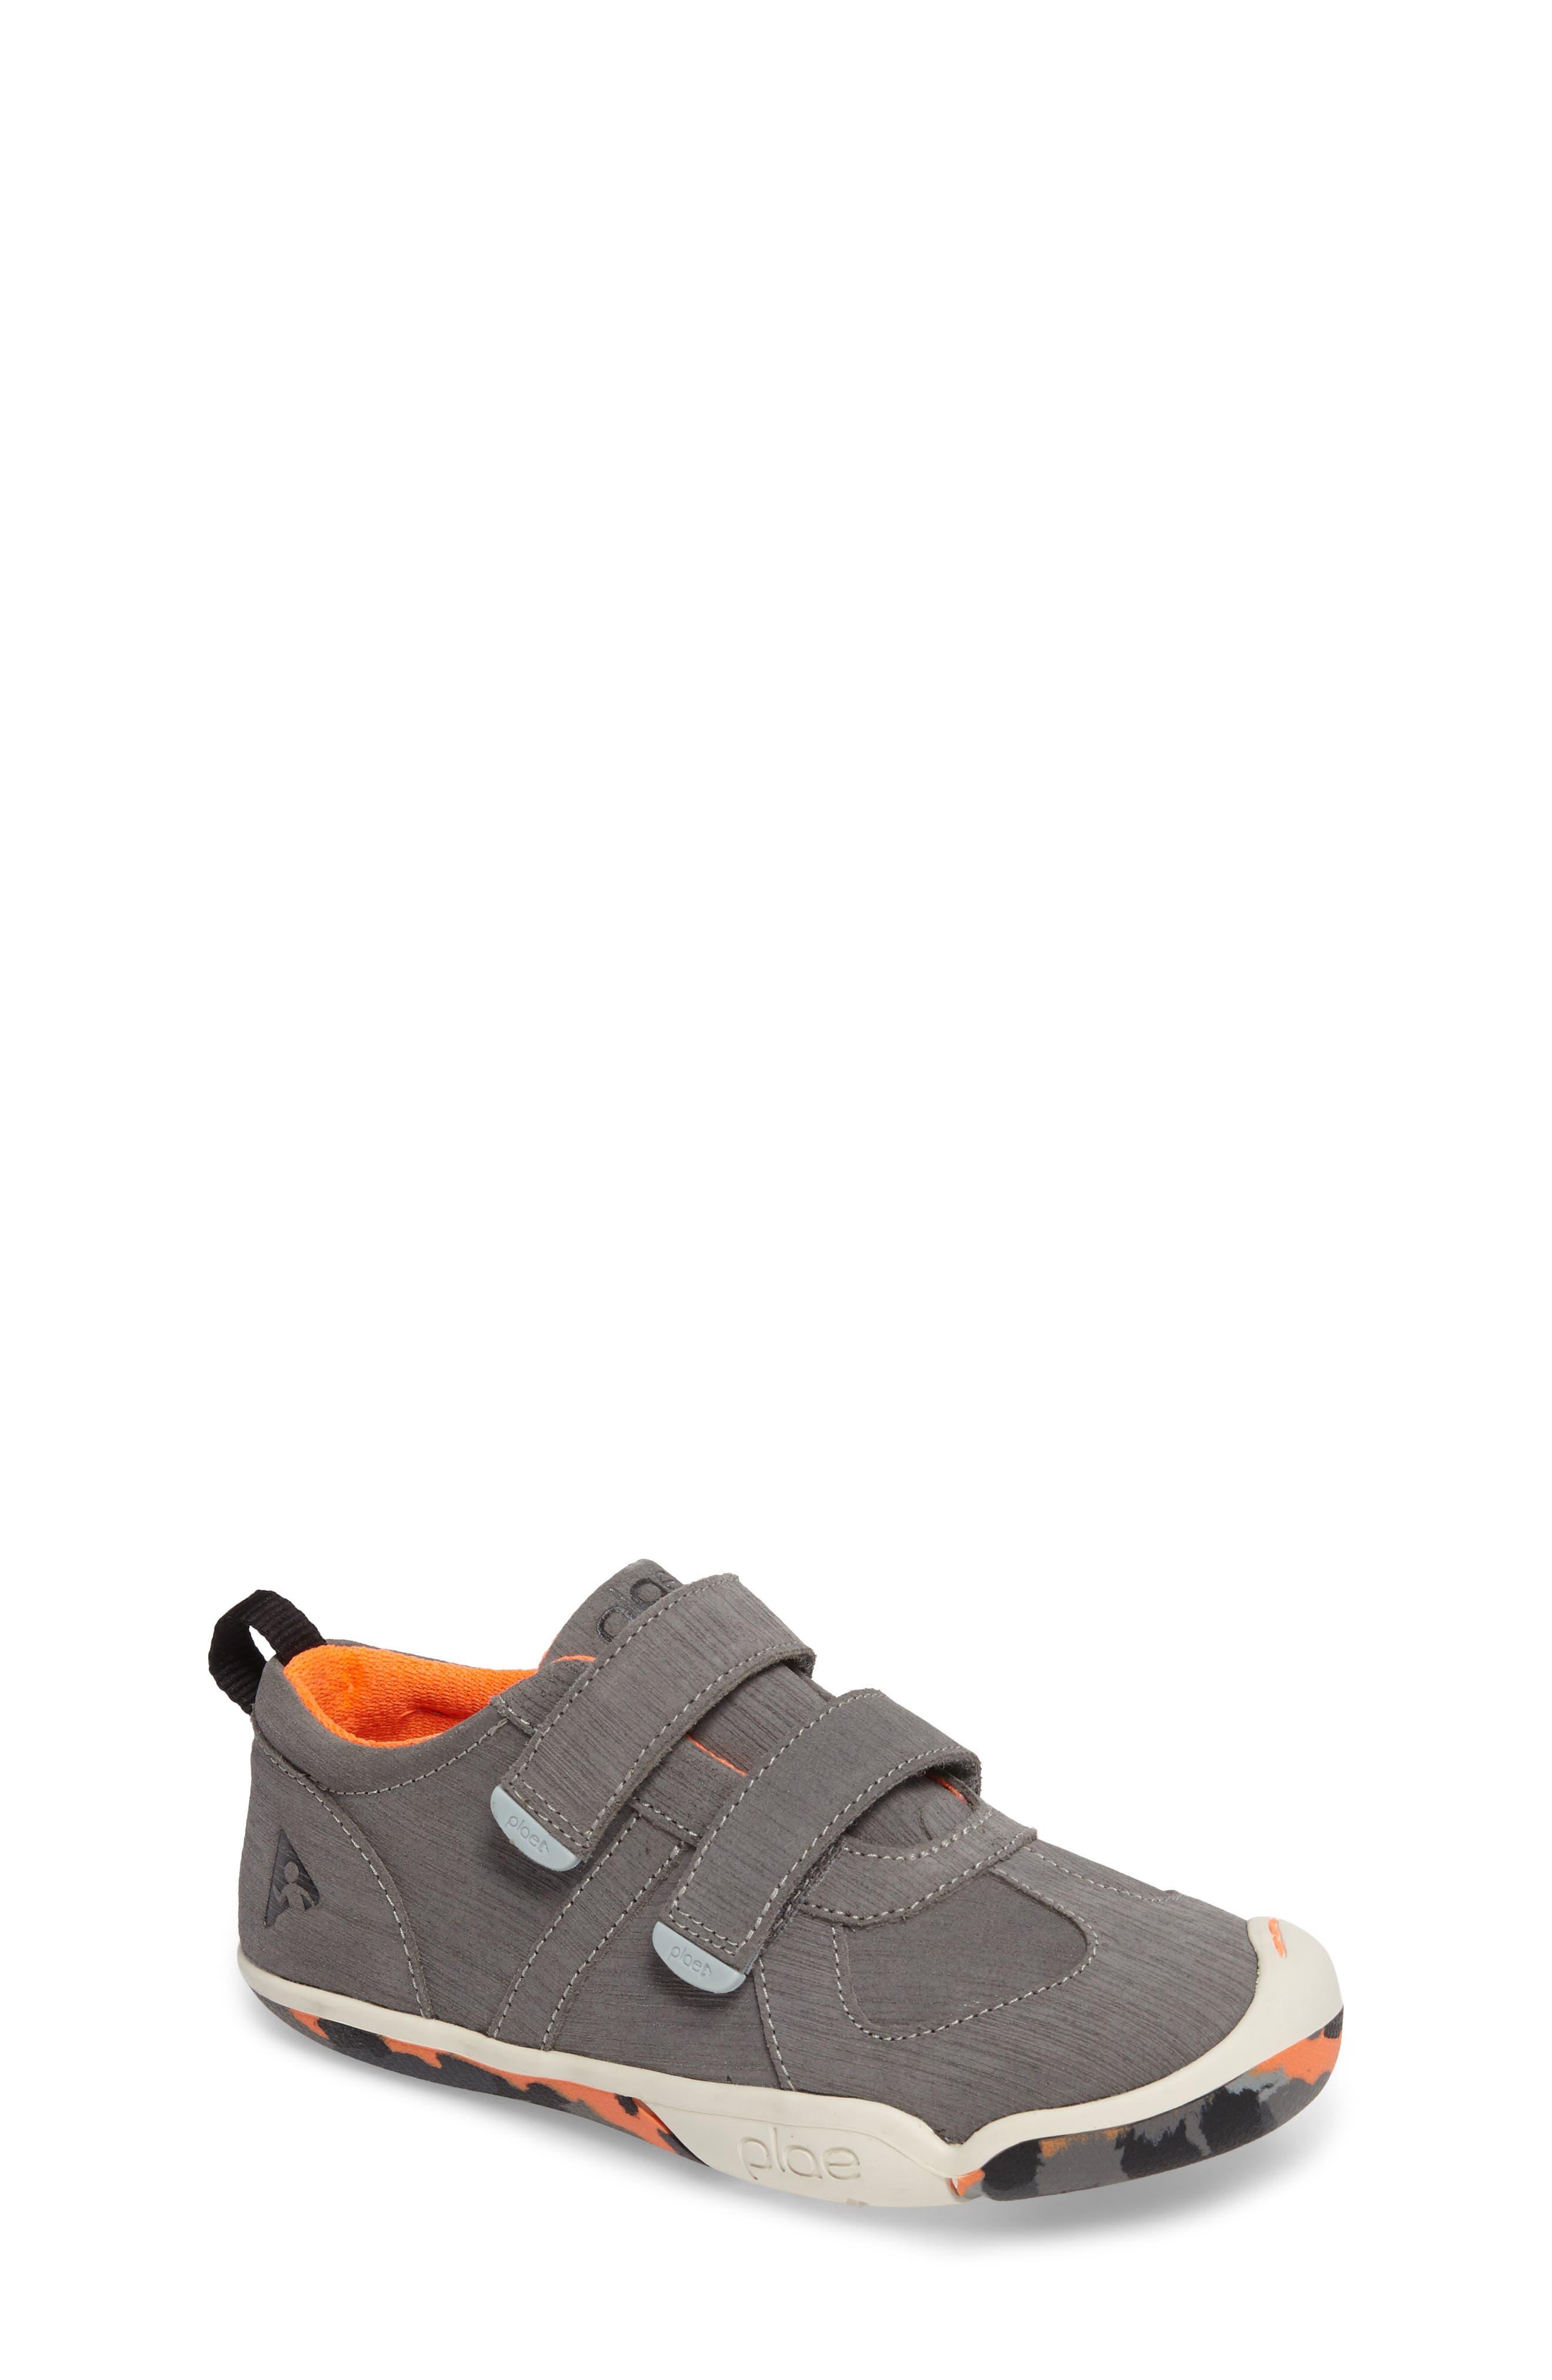 Alternate Image 1 Selected - PLAE'Nat' Customizable Sneaker(Walker, Toddler, Little Kid & Big Kid)